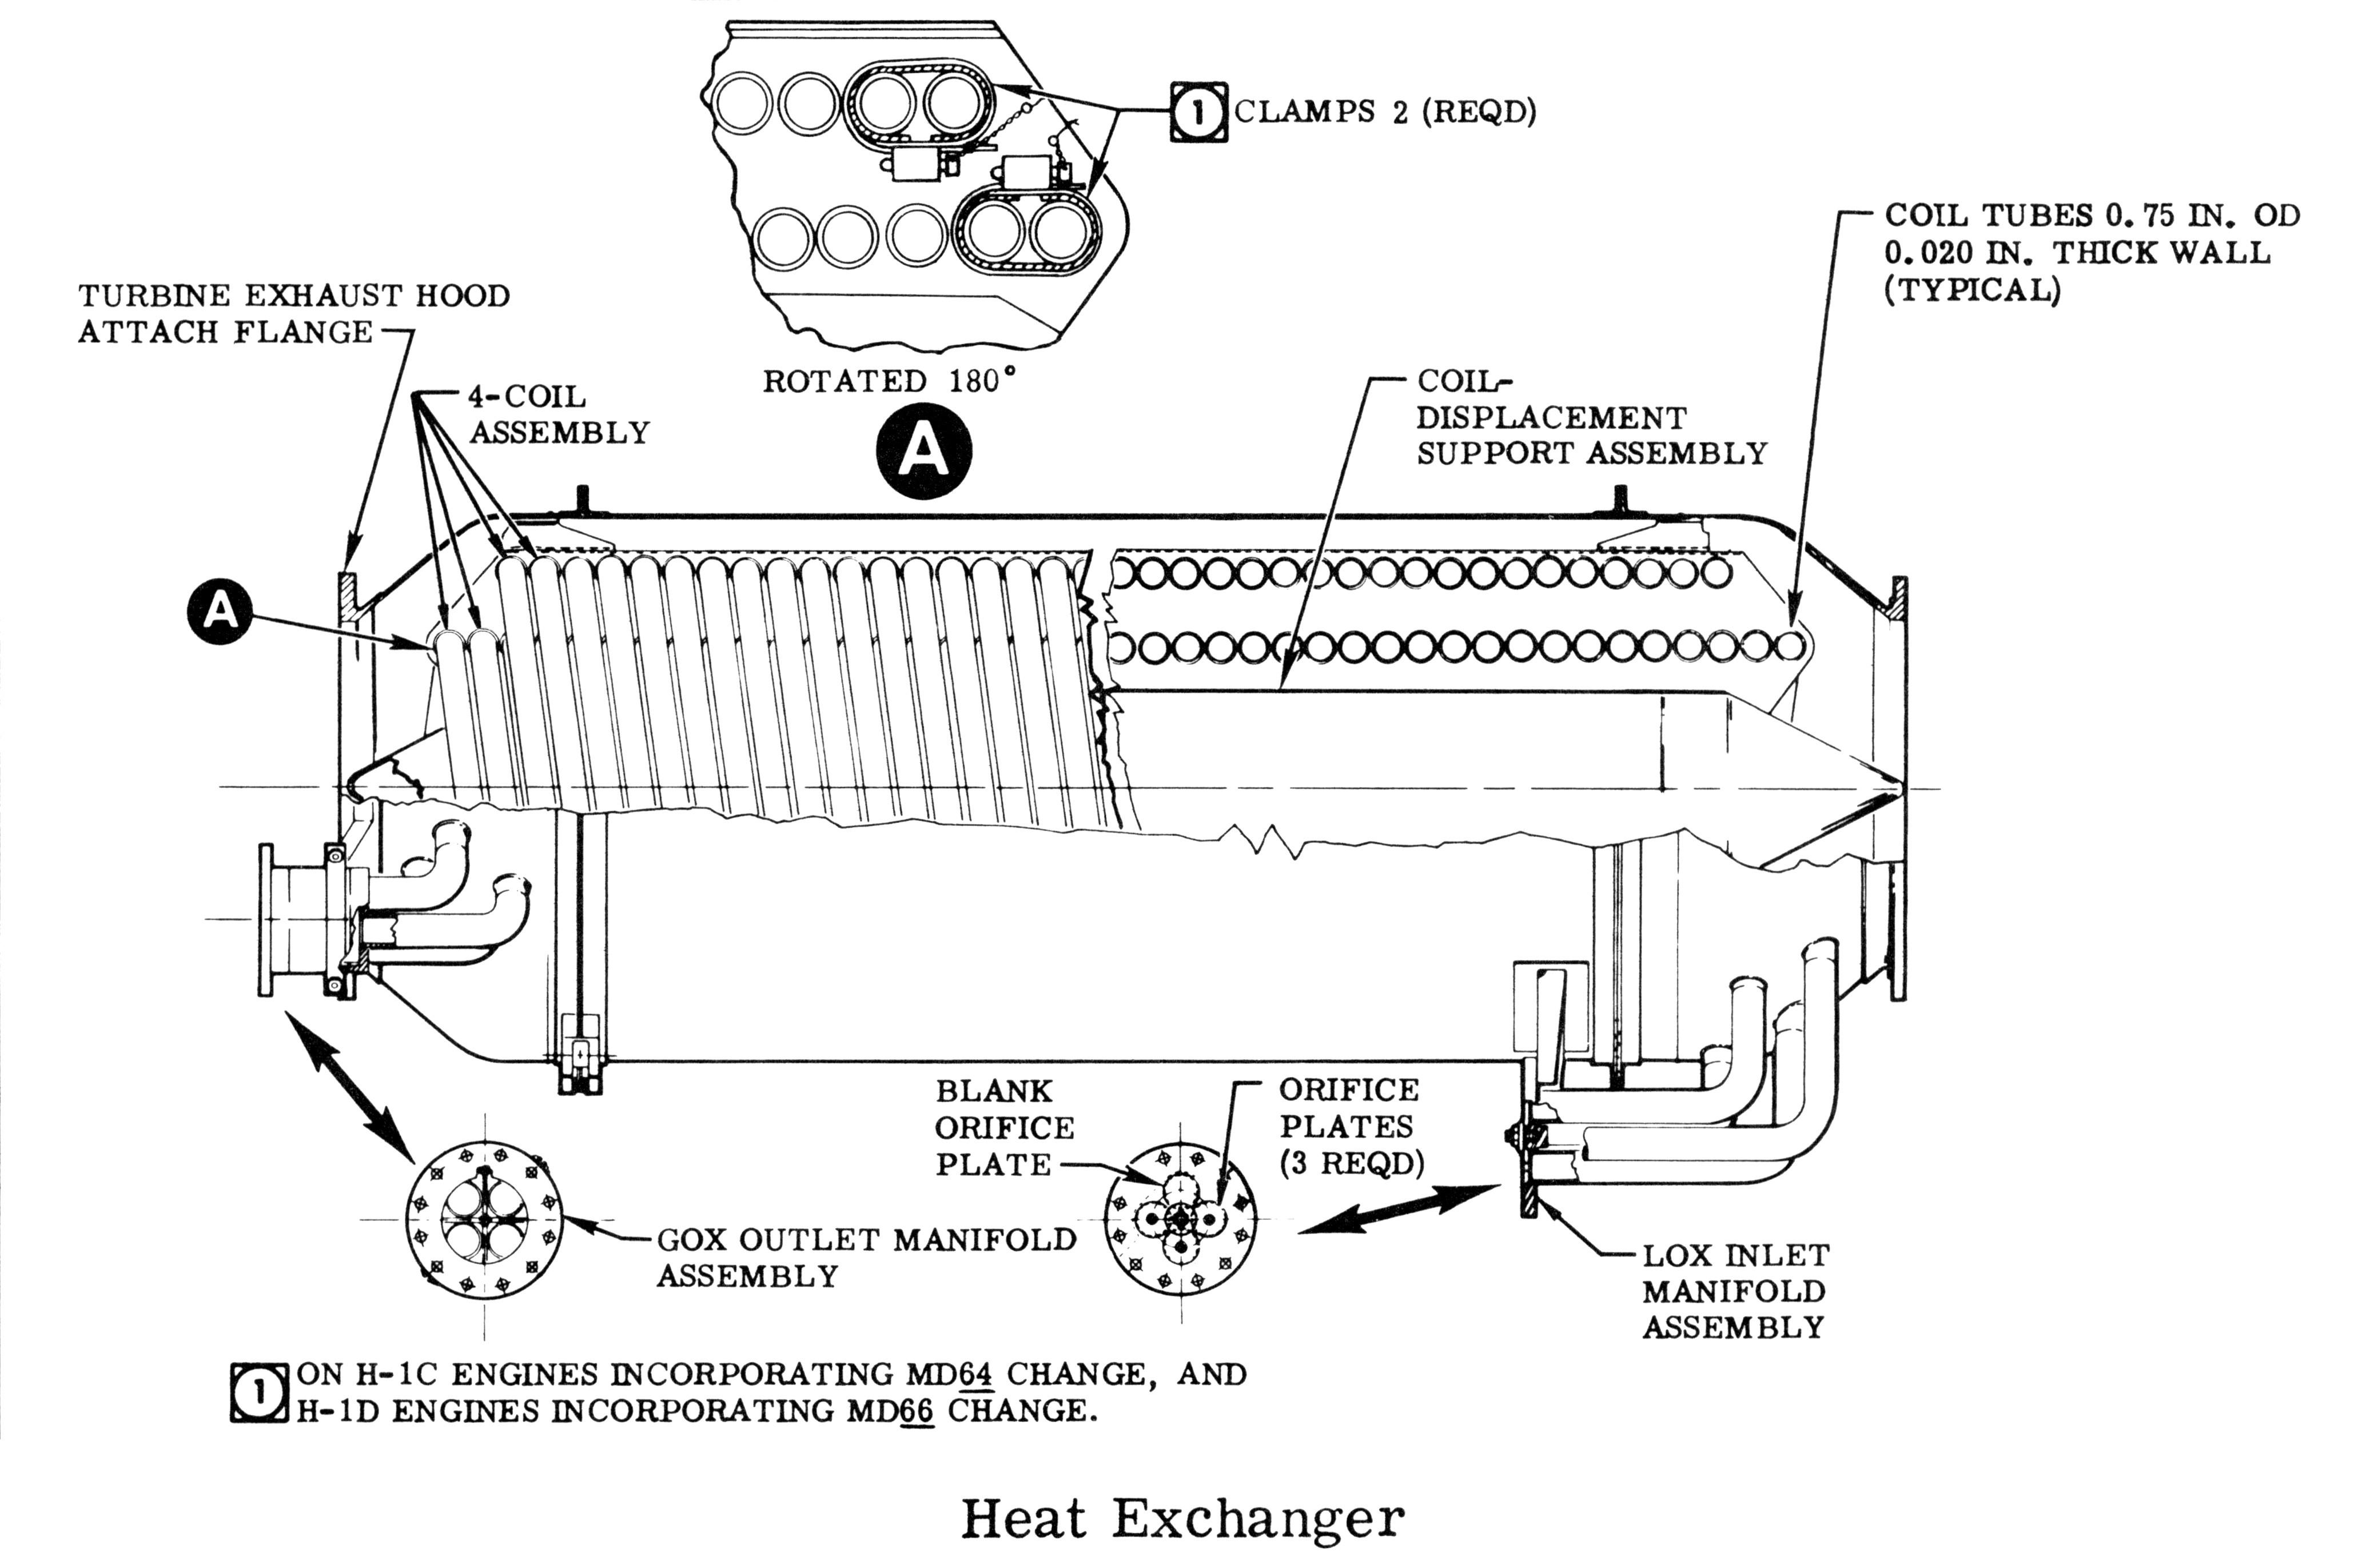 Model Rocket Engine Diagram H 1 Heat Exchanger Of Model Rocket Engine Diagram